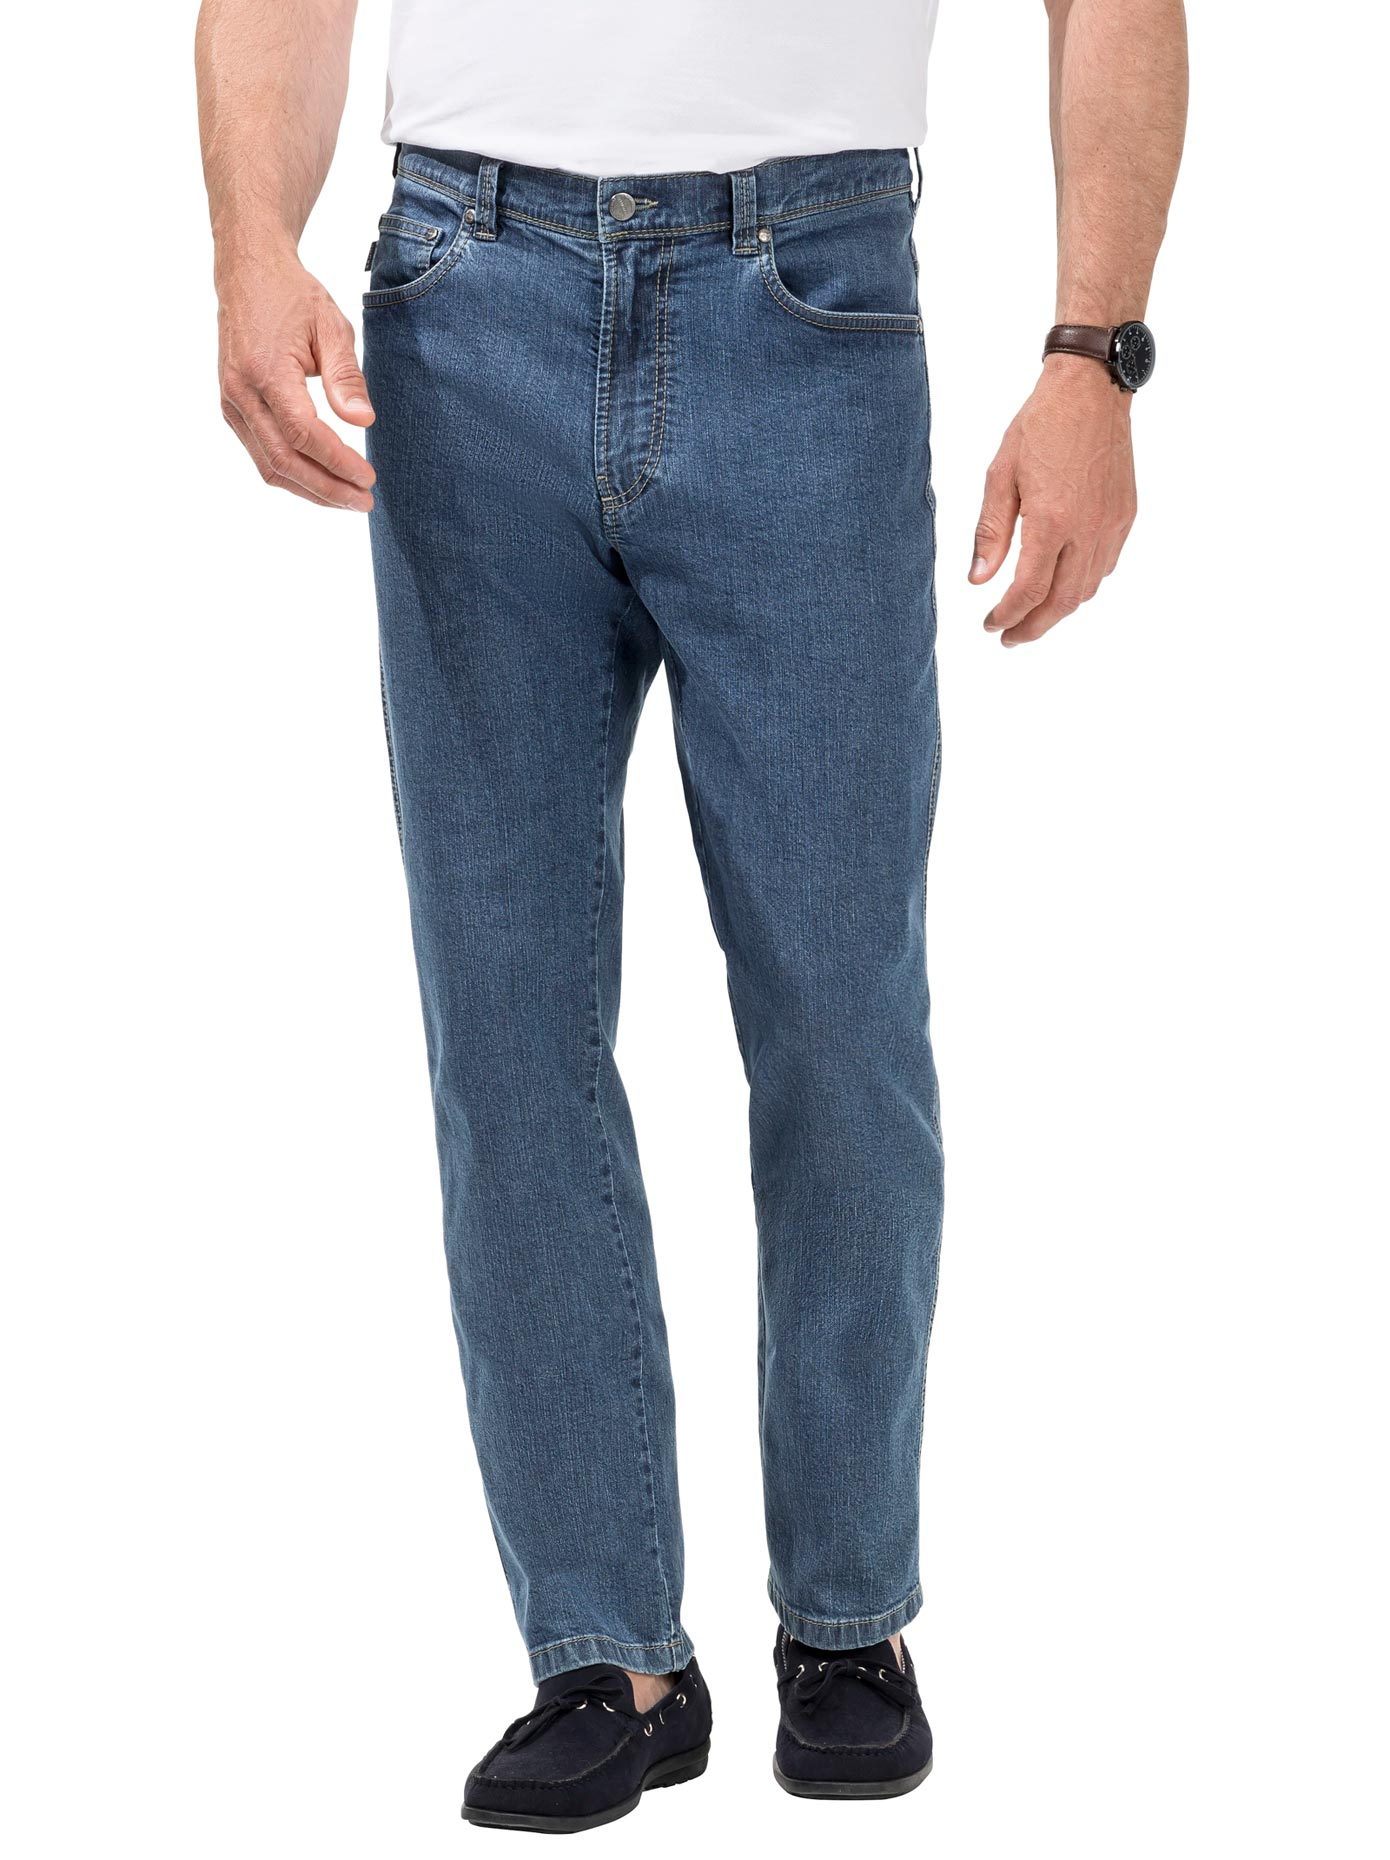 Image of Brühl Jeans in elastischer Qualität